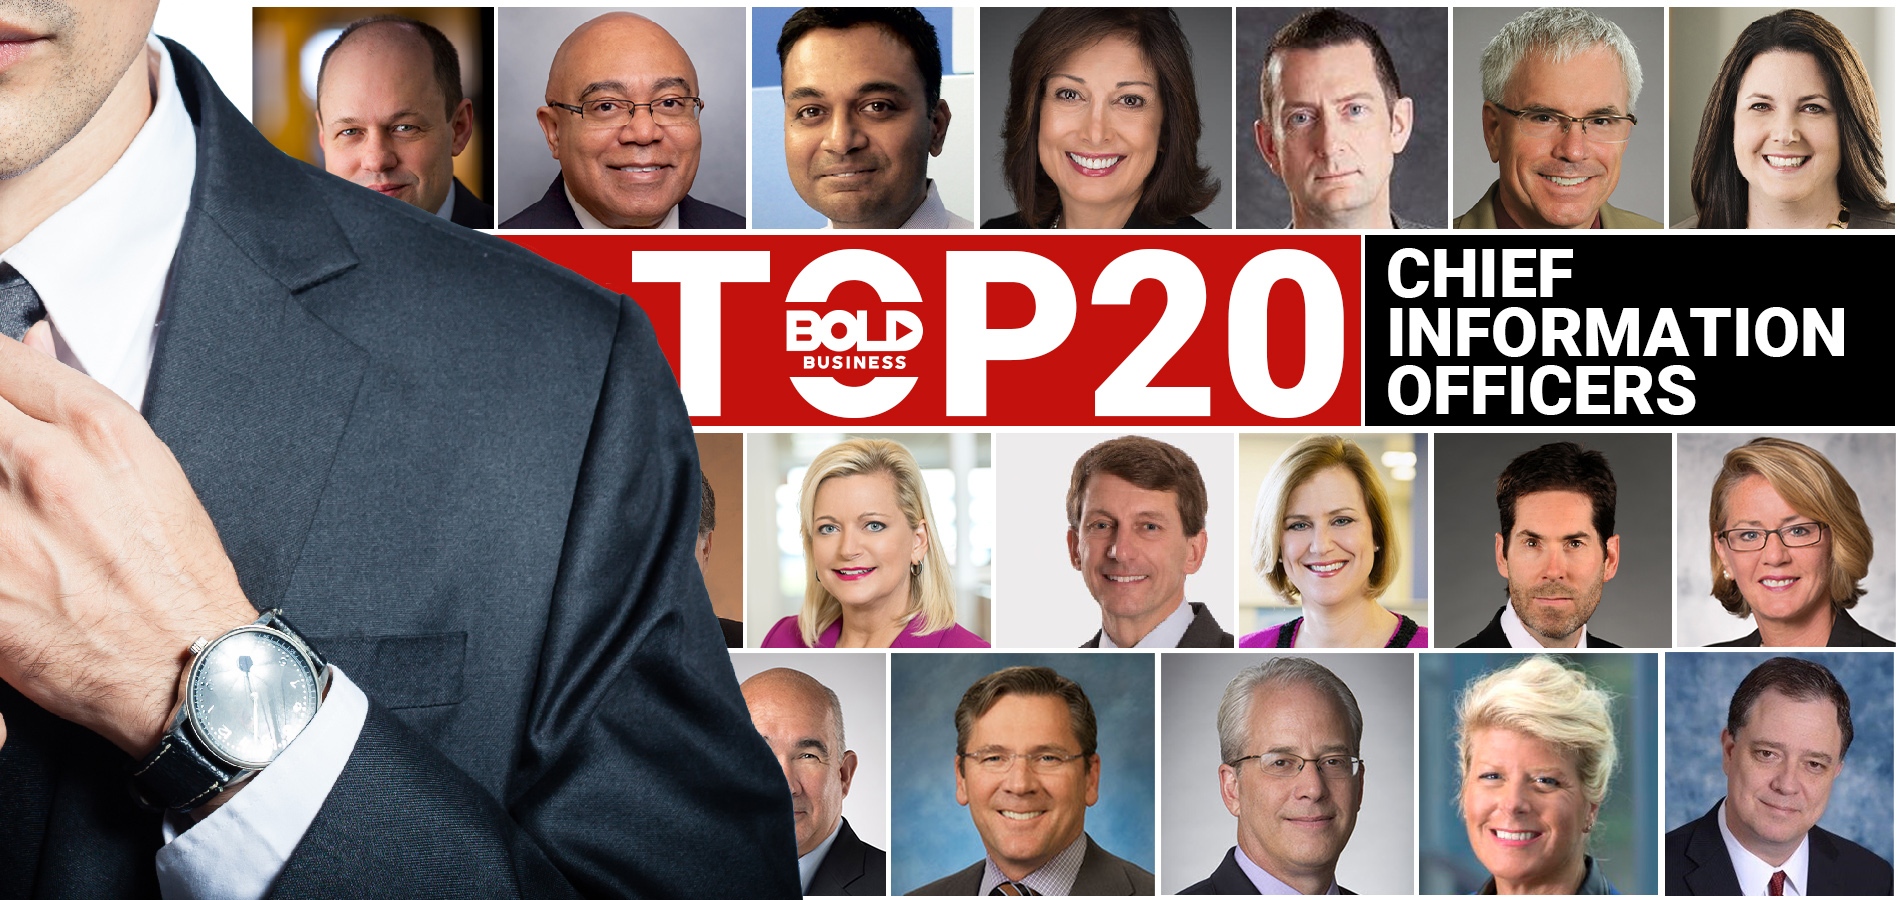 Bold Business' Top 20 CIO's